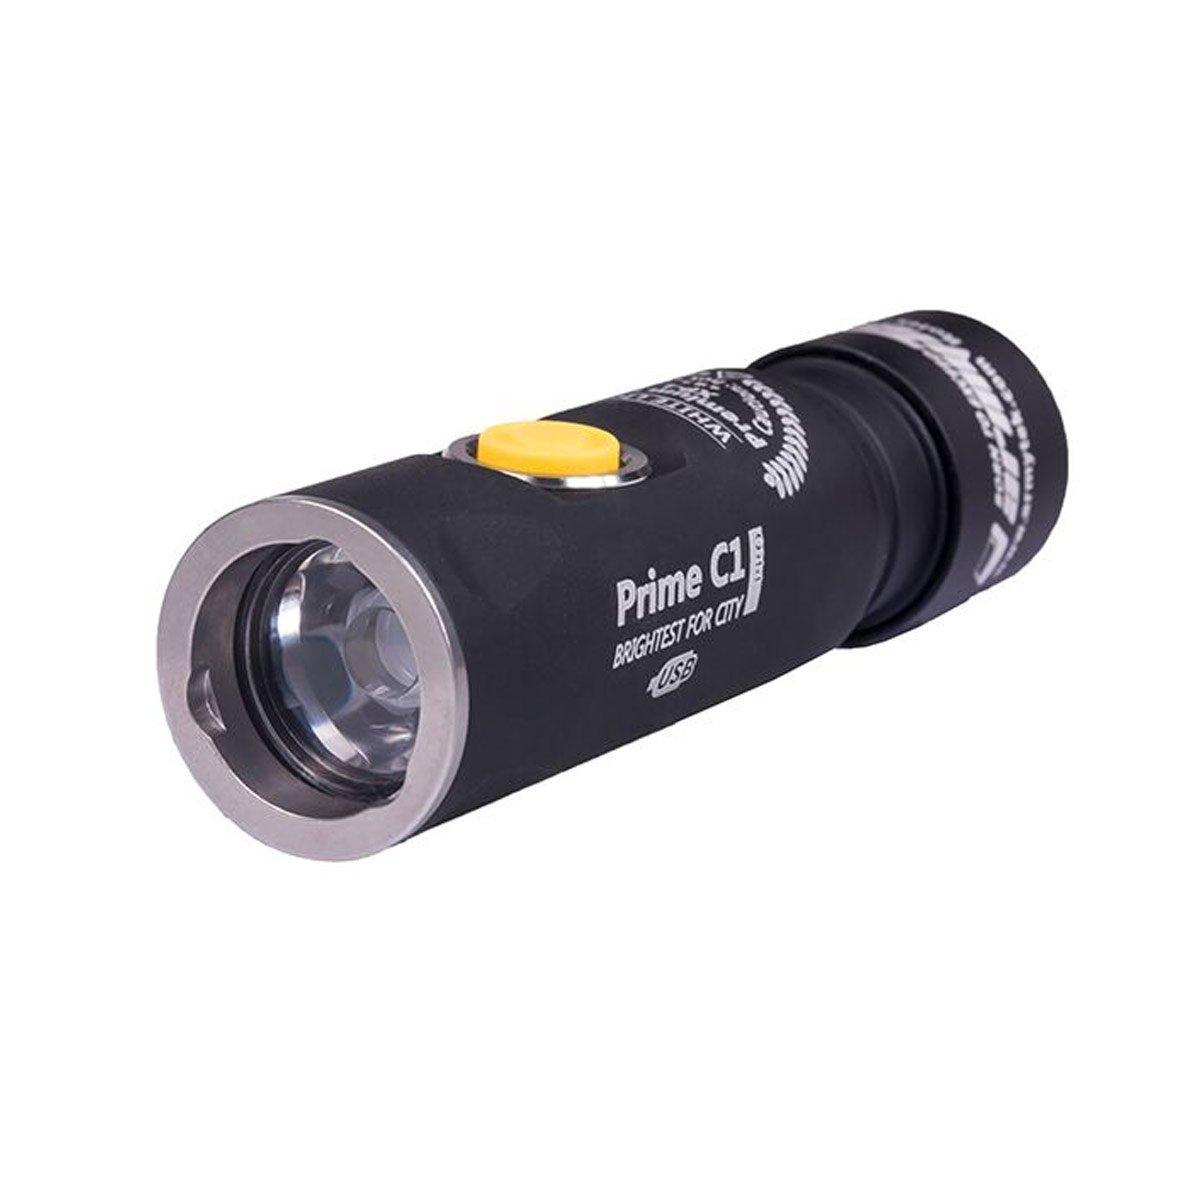 Armytek Prime C1 Pro LED Taschenlampe akkubetrieben 970lm 58g